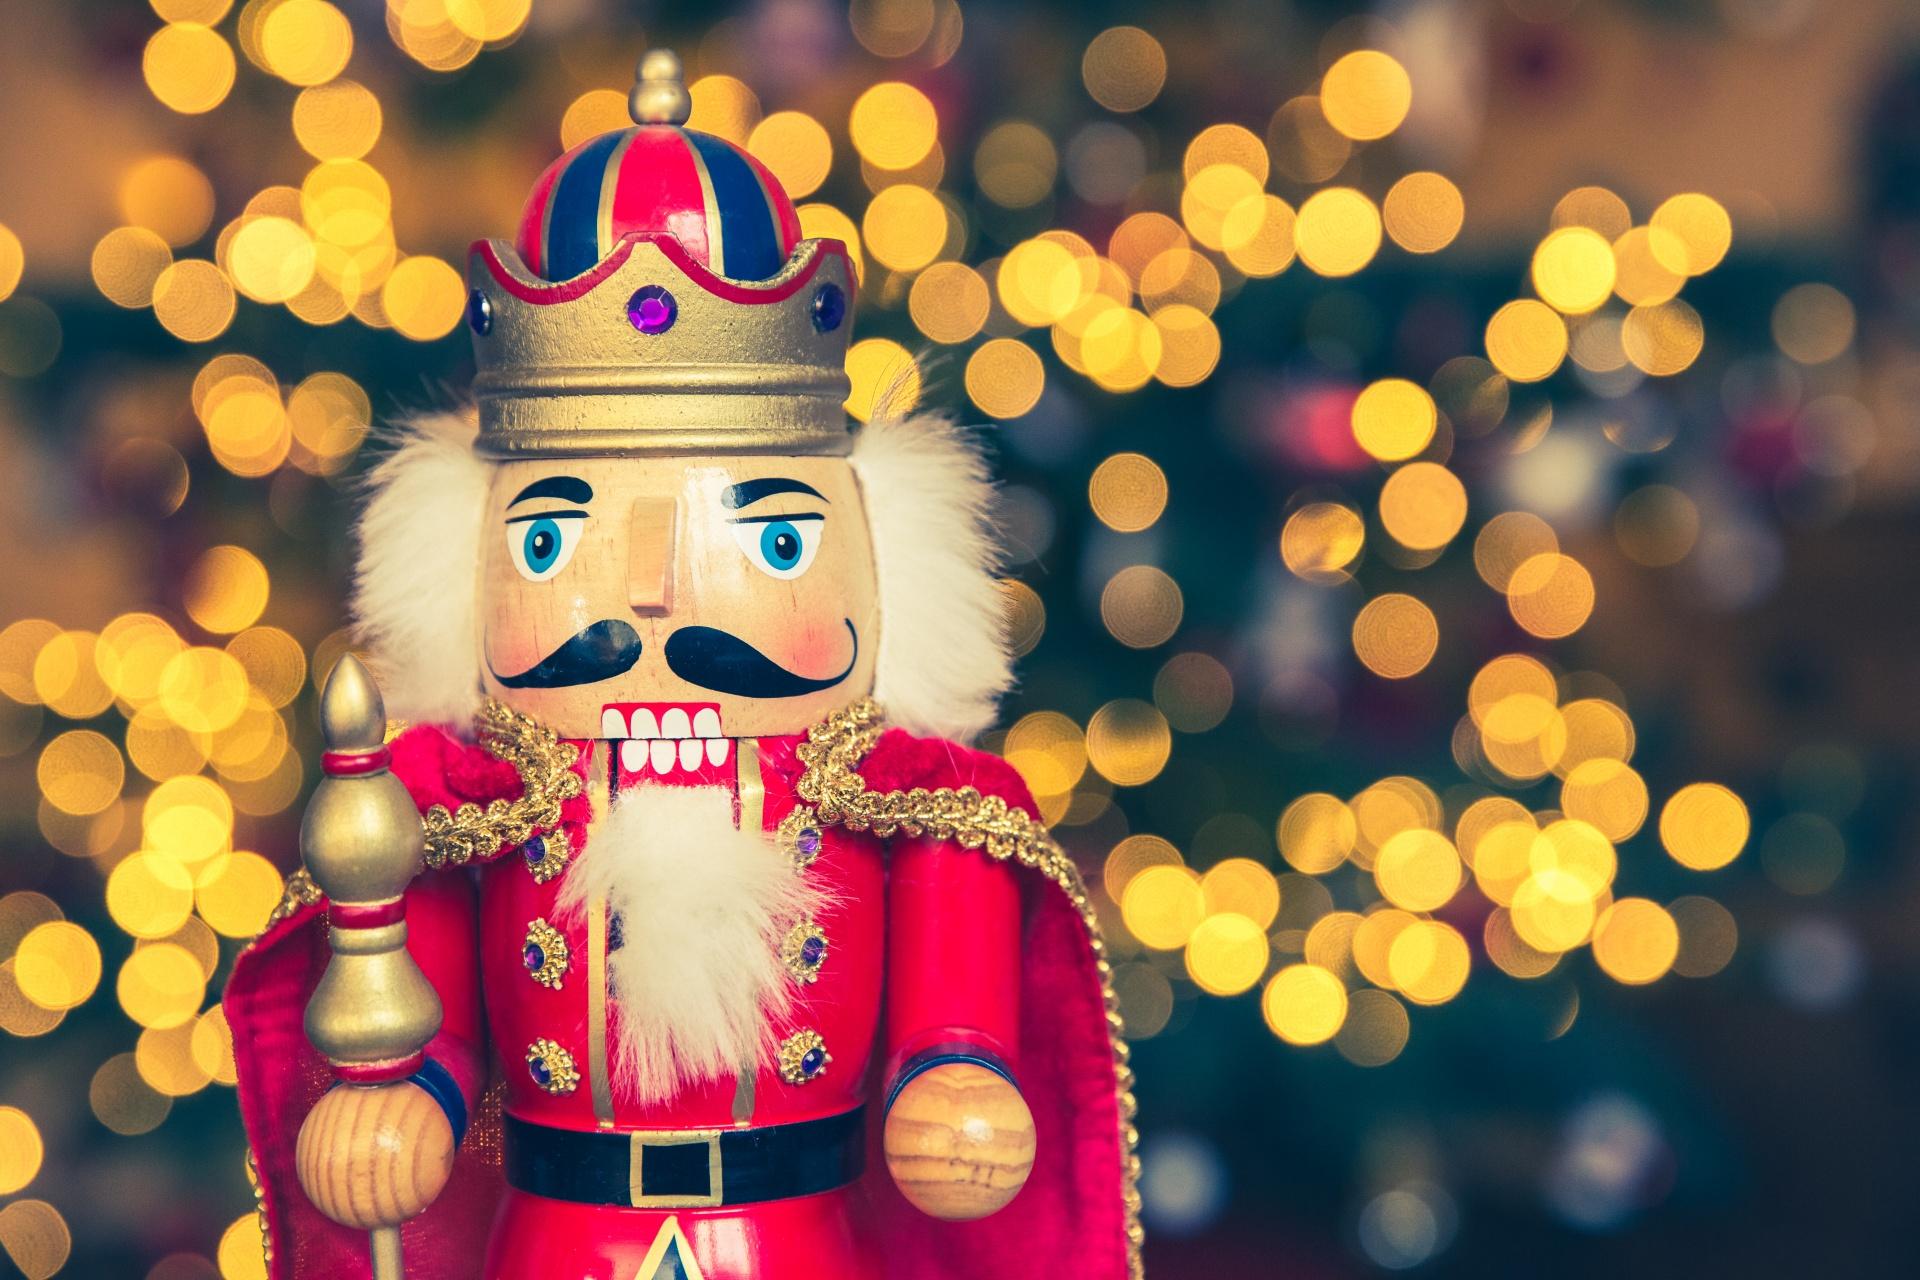 Charming Christmas Decorations On Decor With Christmas